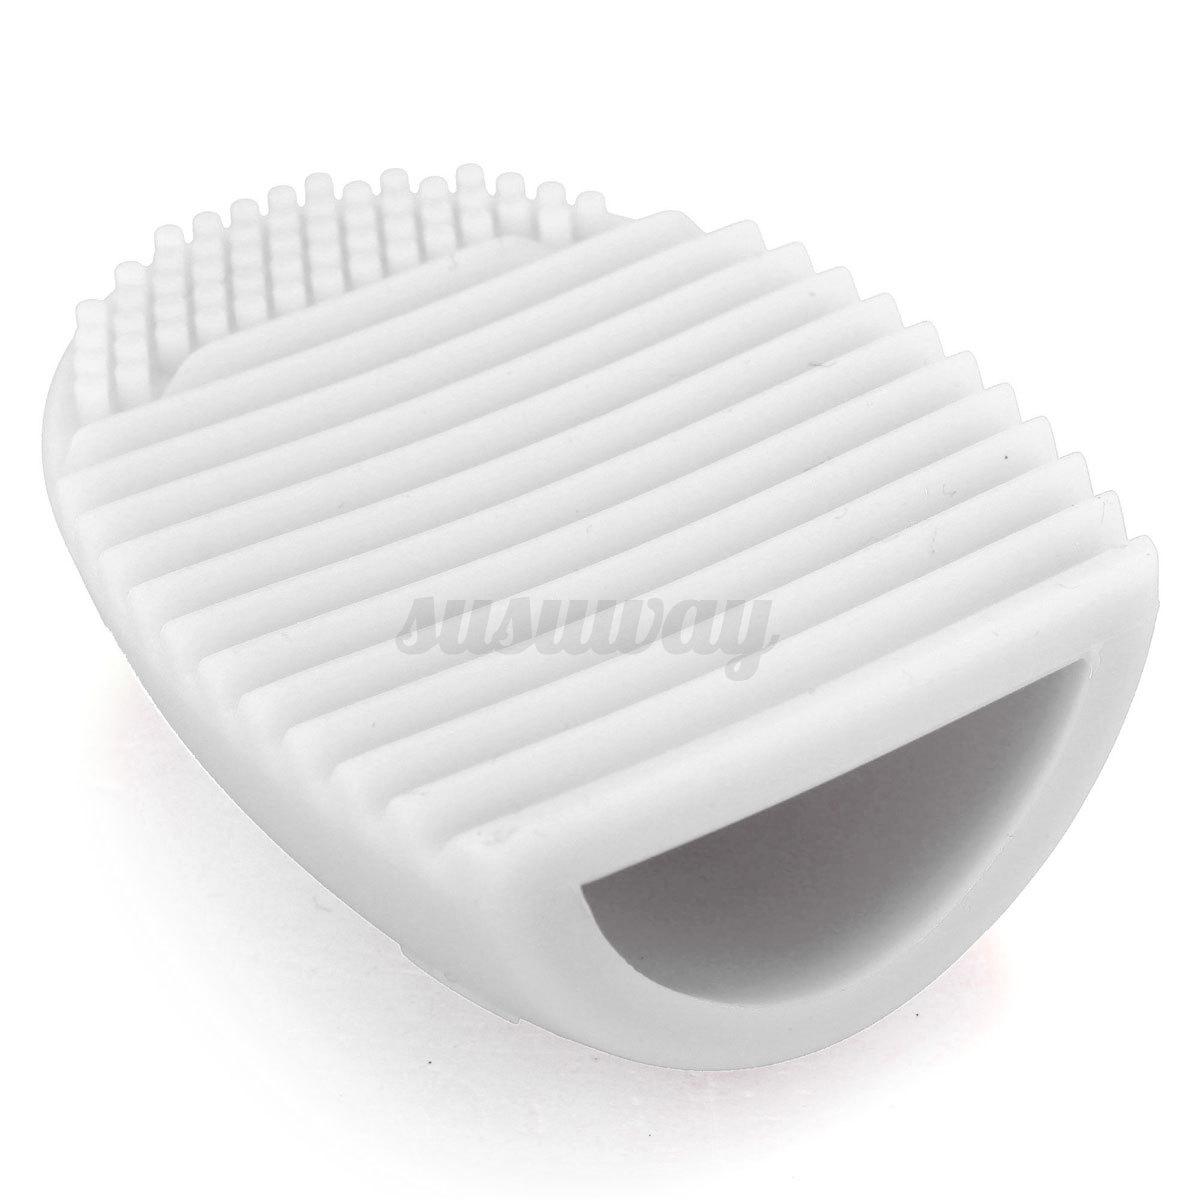 Brush-Egg-Wash-Artifact-Cleaning-Hanging-Finger-Glove-Makeup-Holder-Beauty-Tools